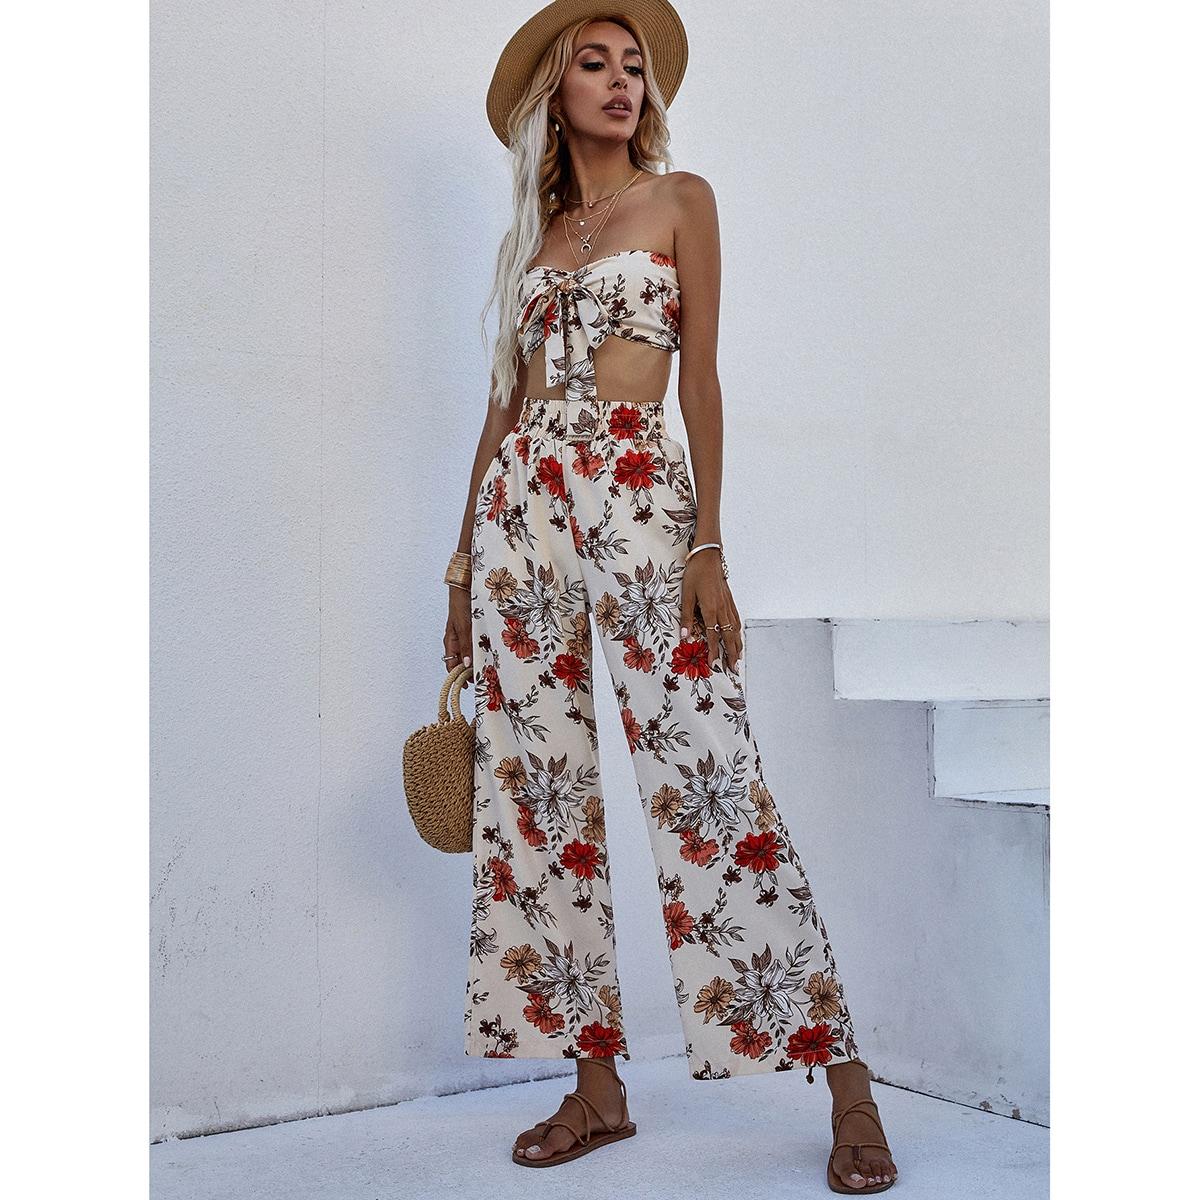 Floral Print Tie Front Tube Top & Elastic Waist Pants Set